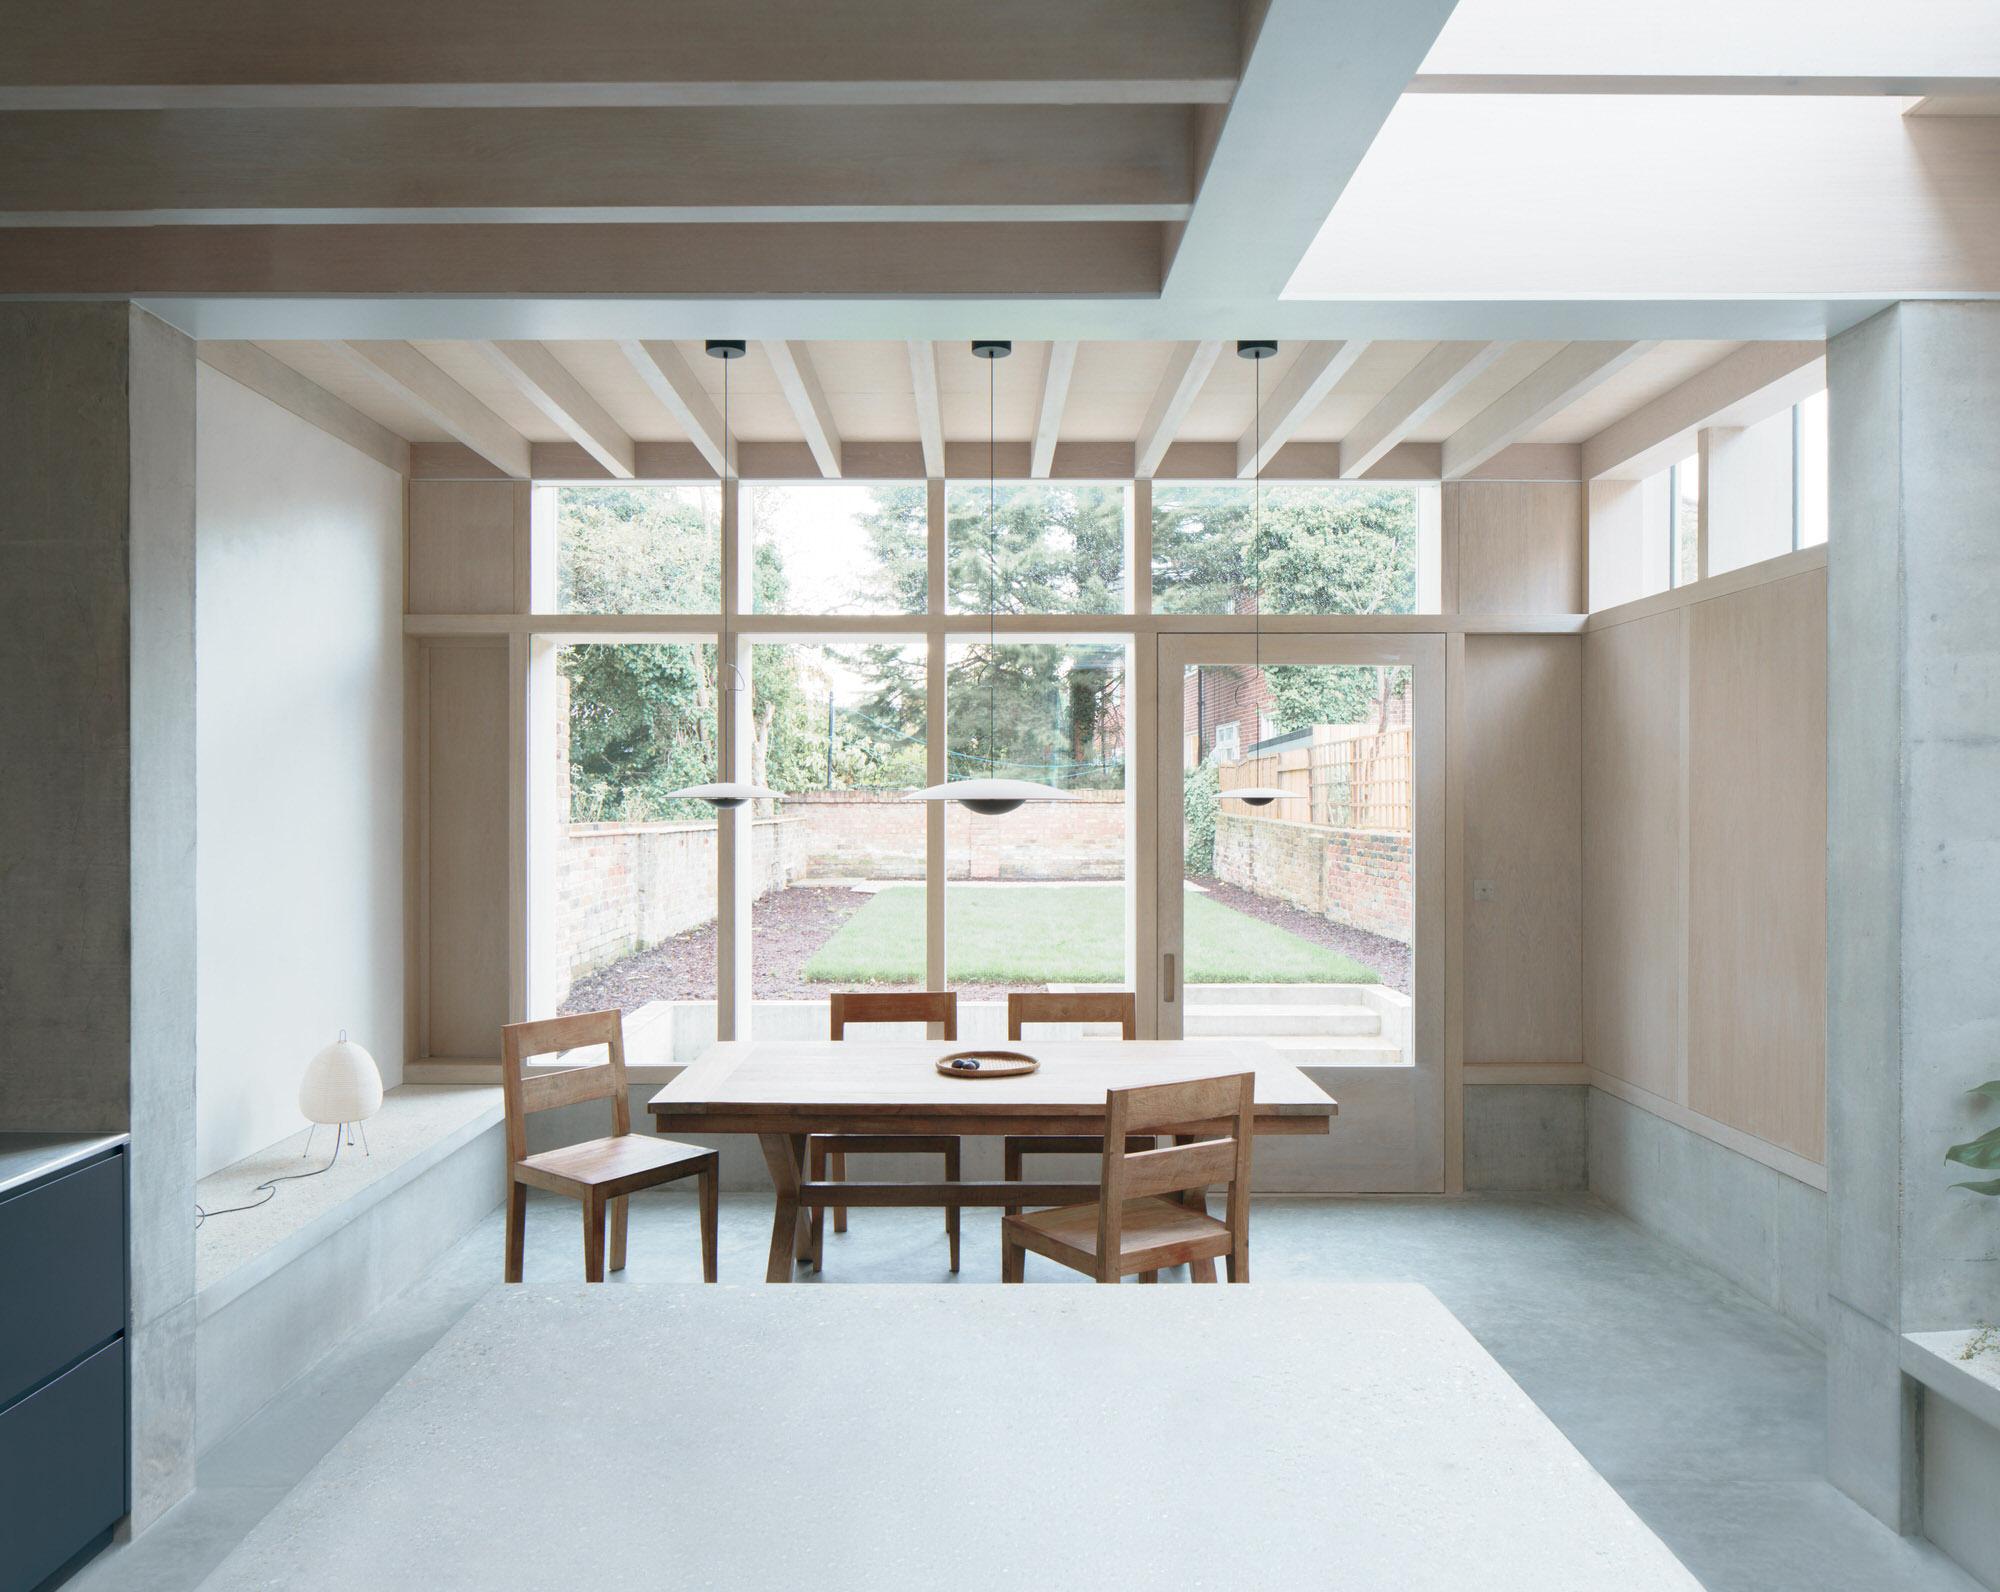 Dgn Studio Concrete Plinth House East London Residential Architecture Photo Nick Dearden Yellowtrace 10